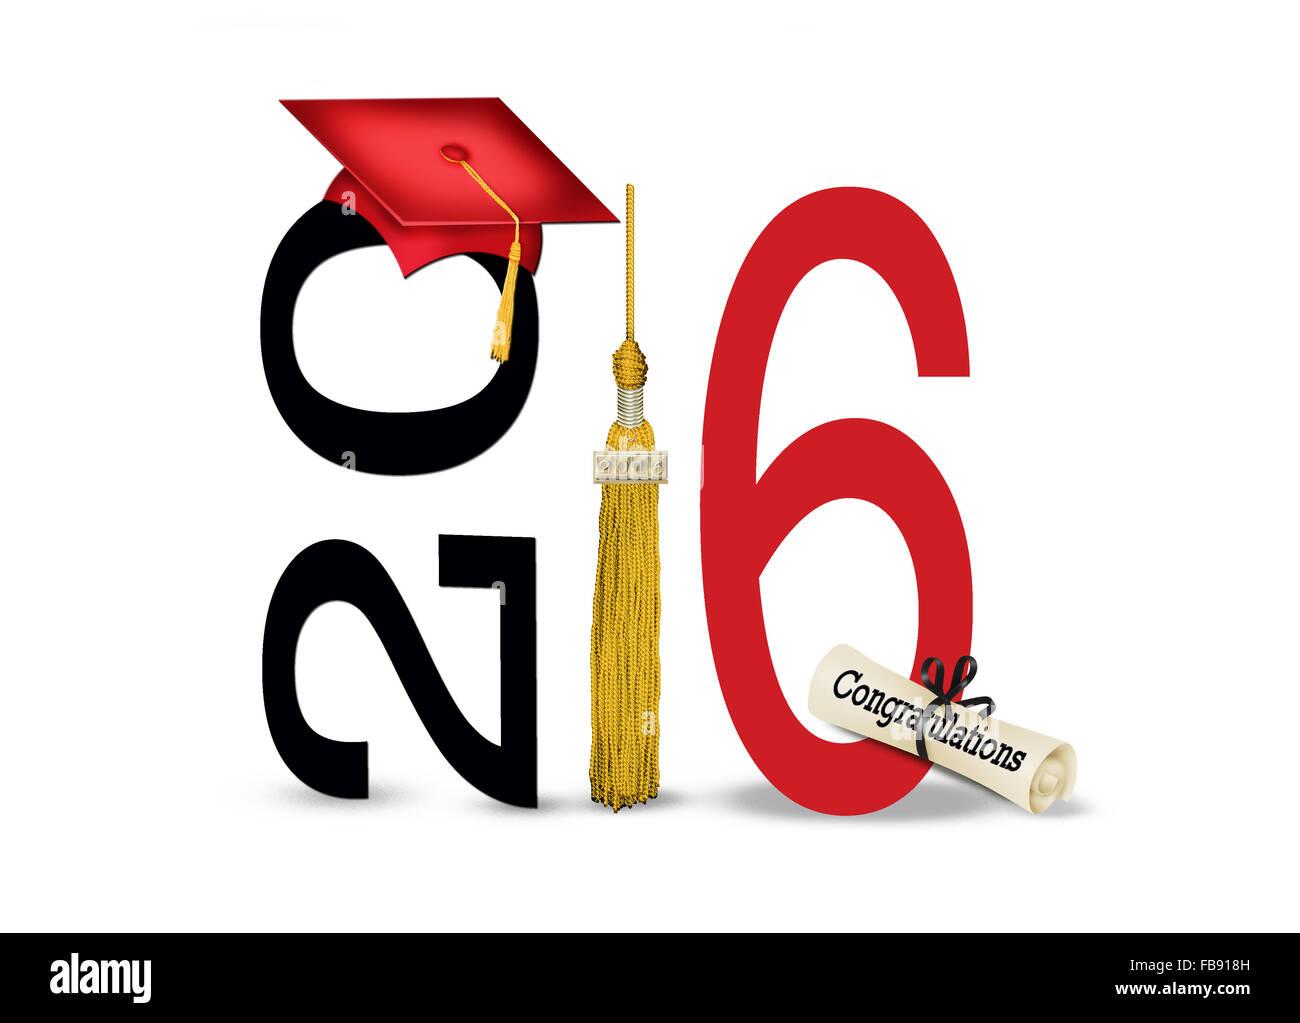 Illustration Black Graduation Cap On Stockfotos & Illustration Black ...